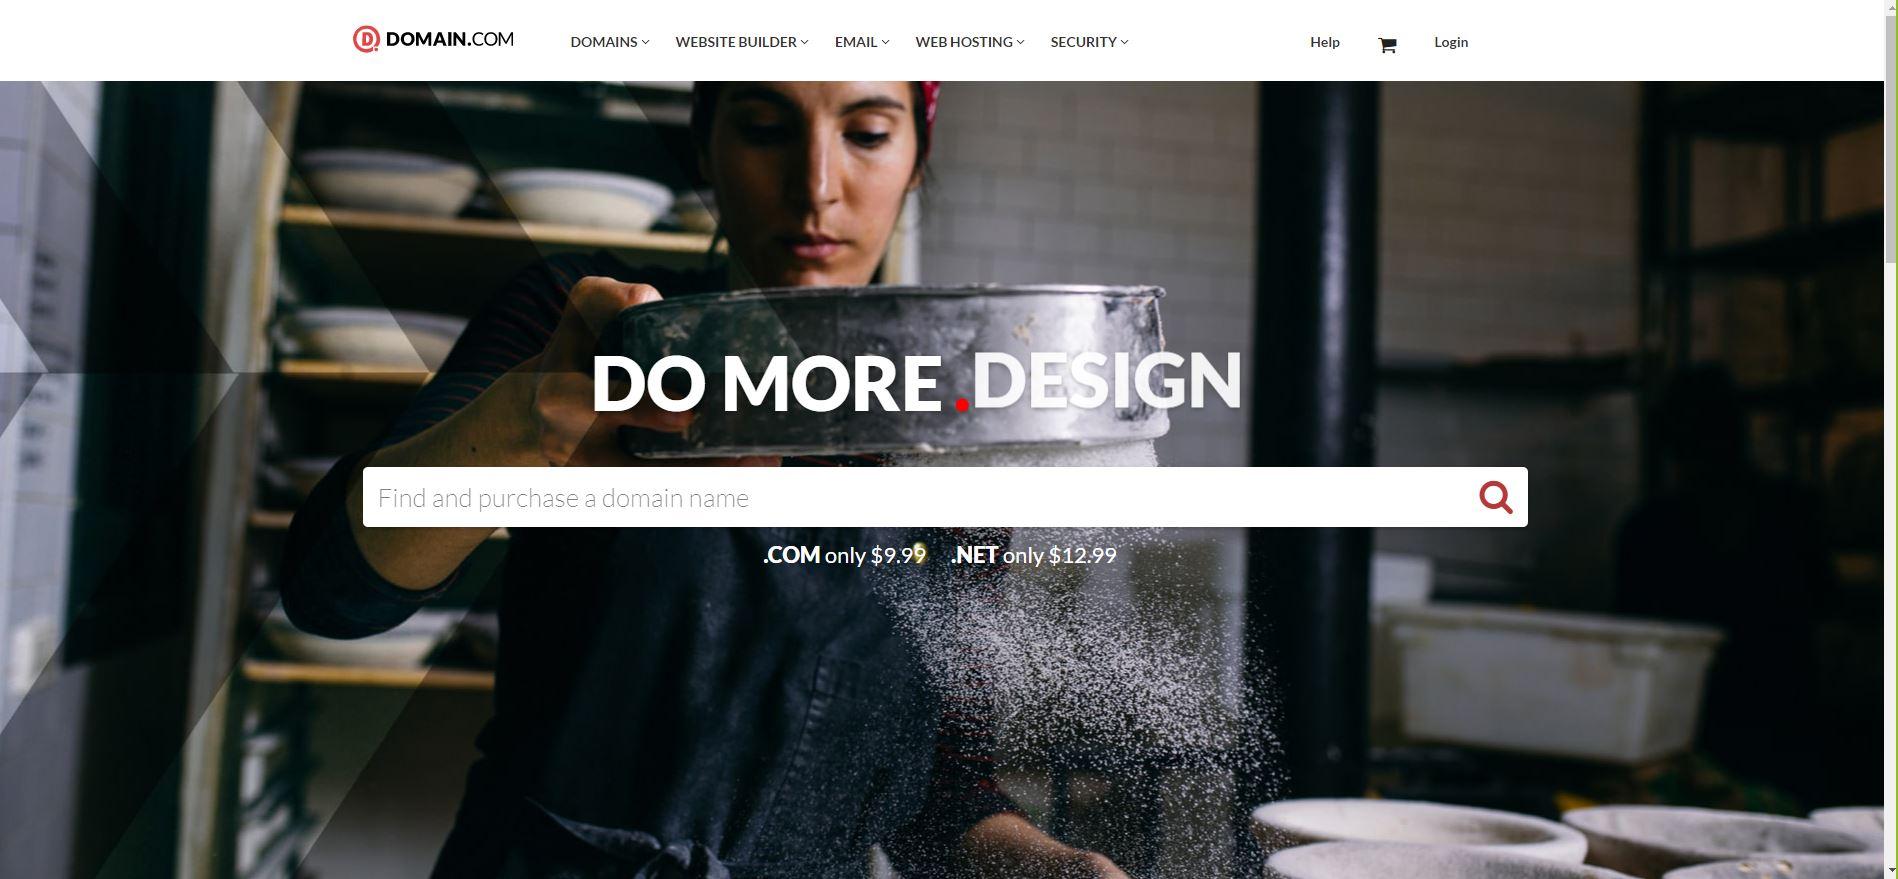 domain dot com screen